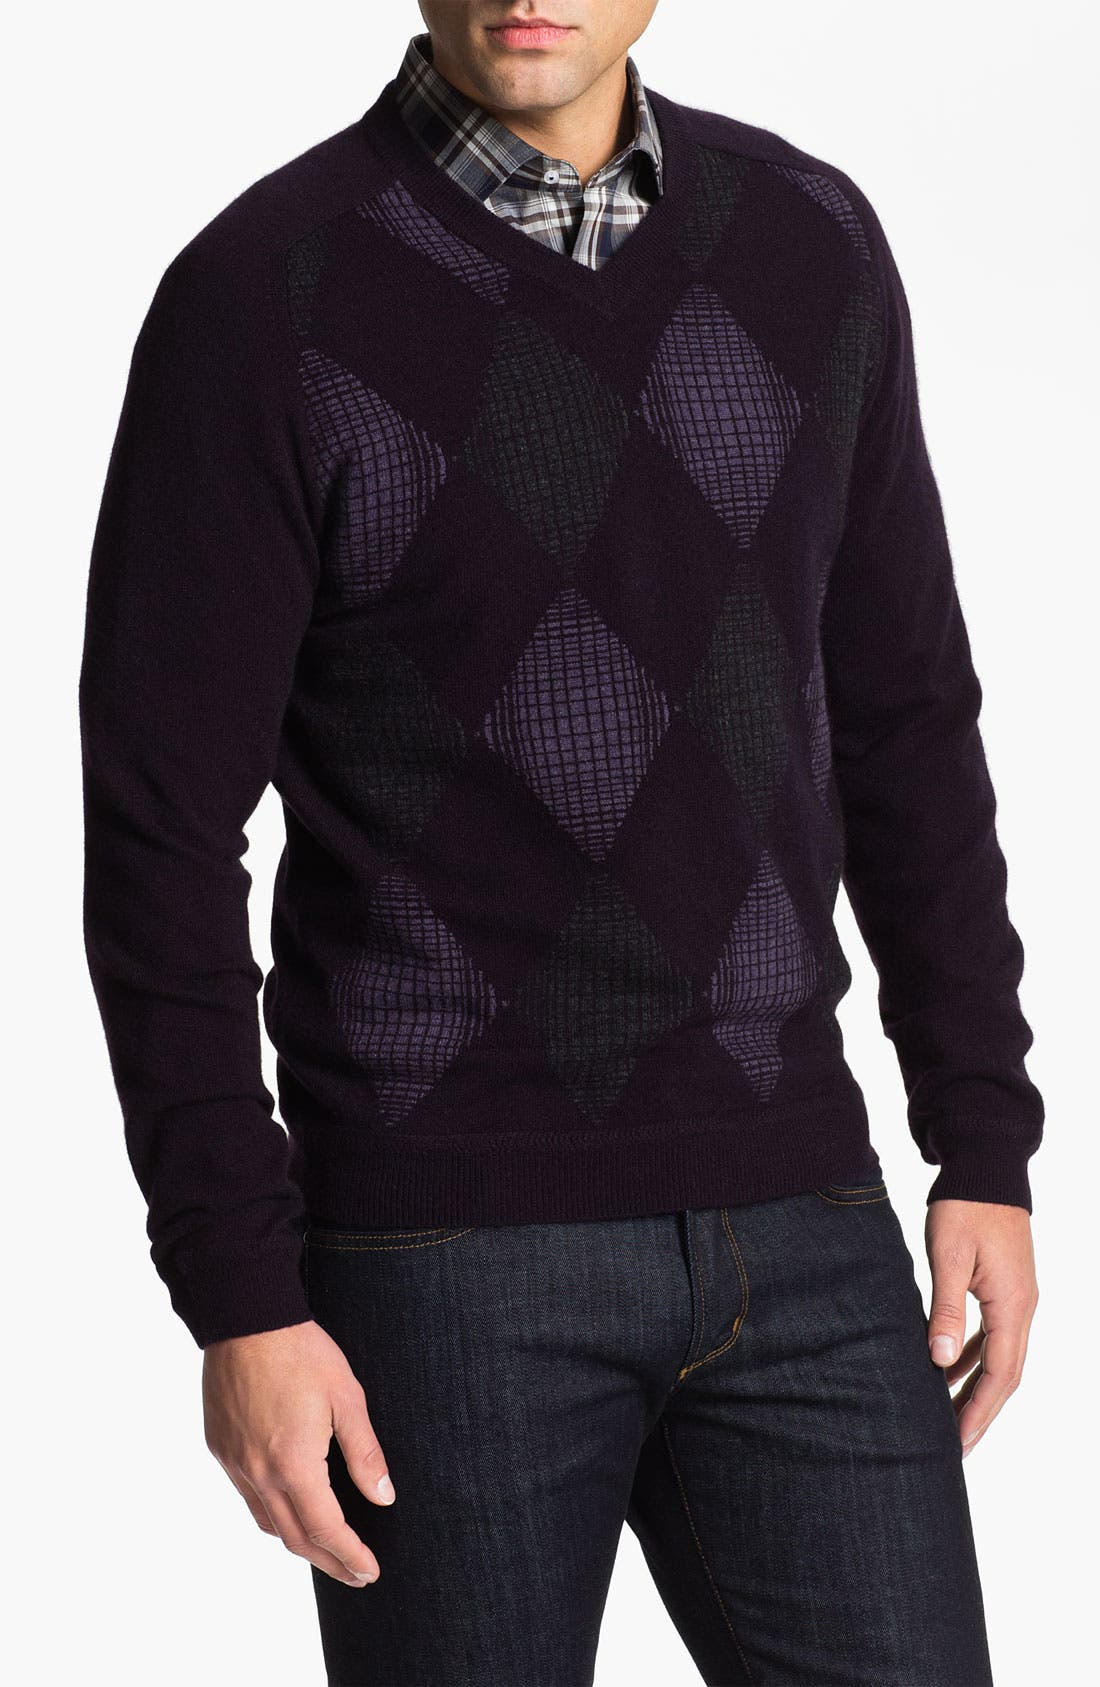 Main Image - John W. Nordstrom® Cashmere V-Neck Sweater